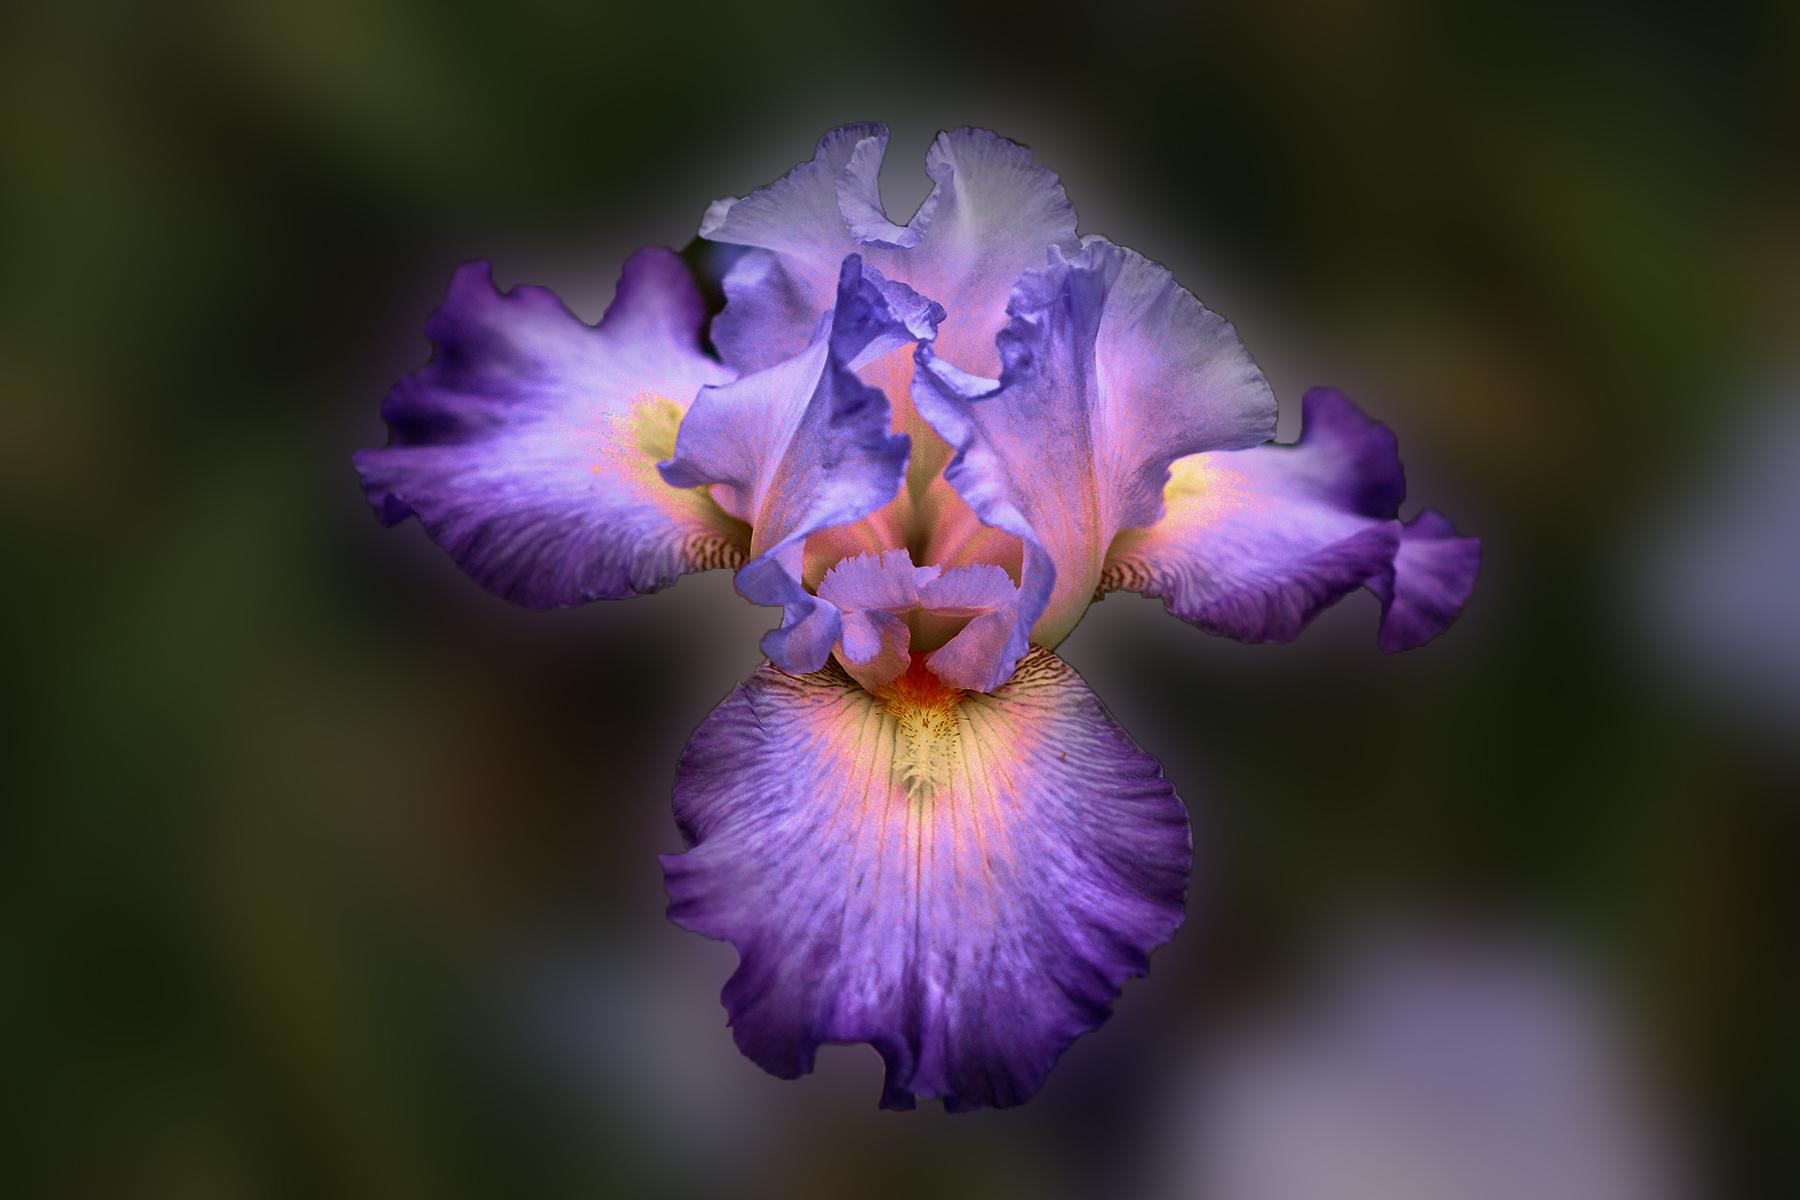 Bella flor purpura - 1800x1200